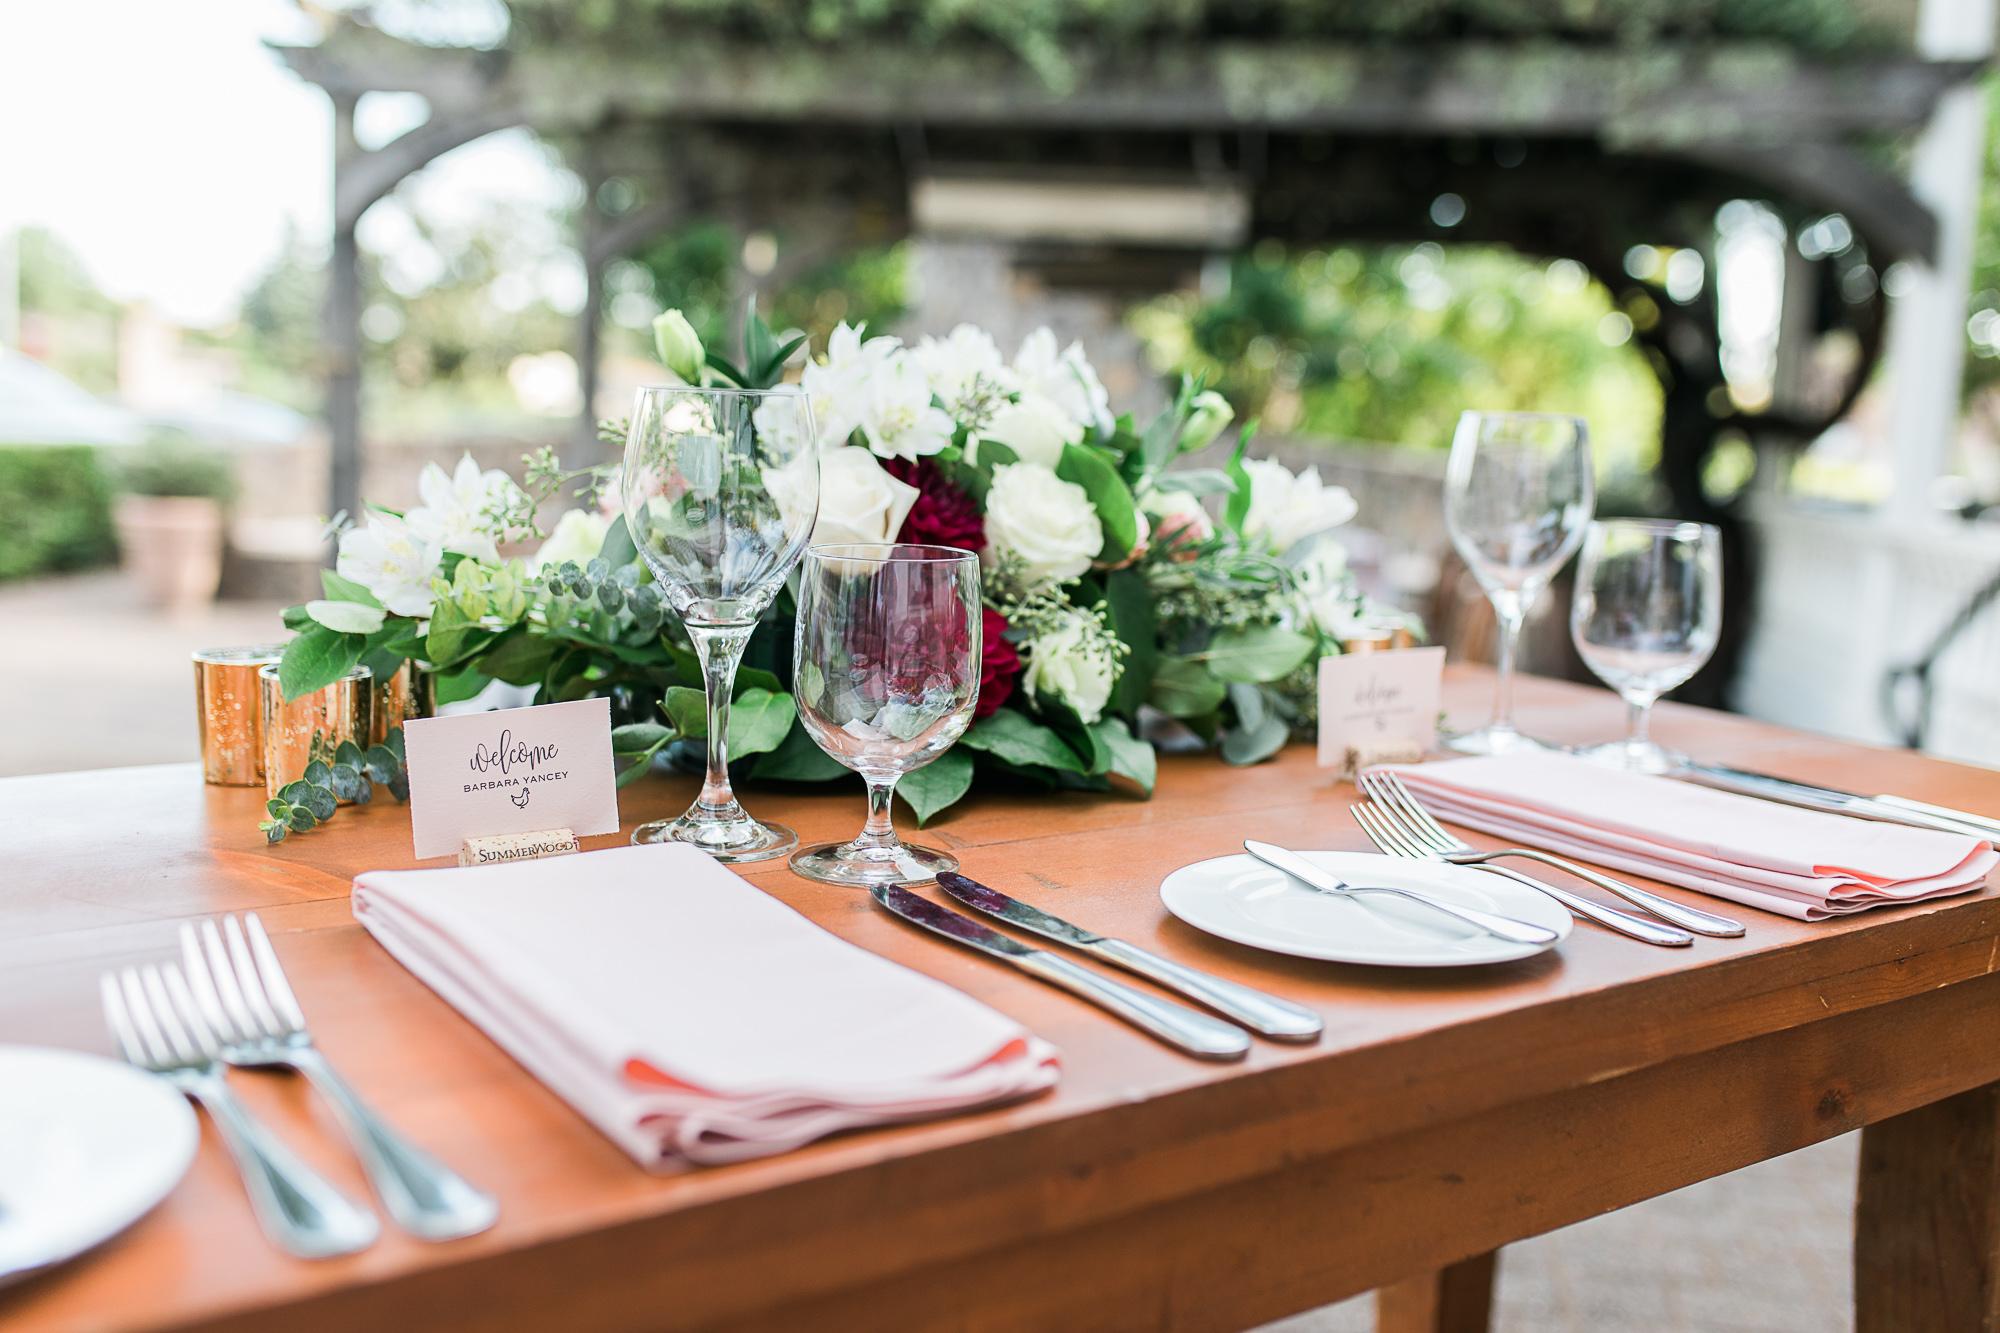 Generals Daughter Wedding Photos by JBJ Pictures - Ramekins Wedding Venue Photographer in Sonoma, Napa (22).jpg